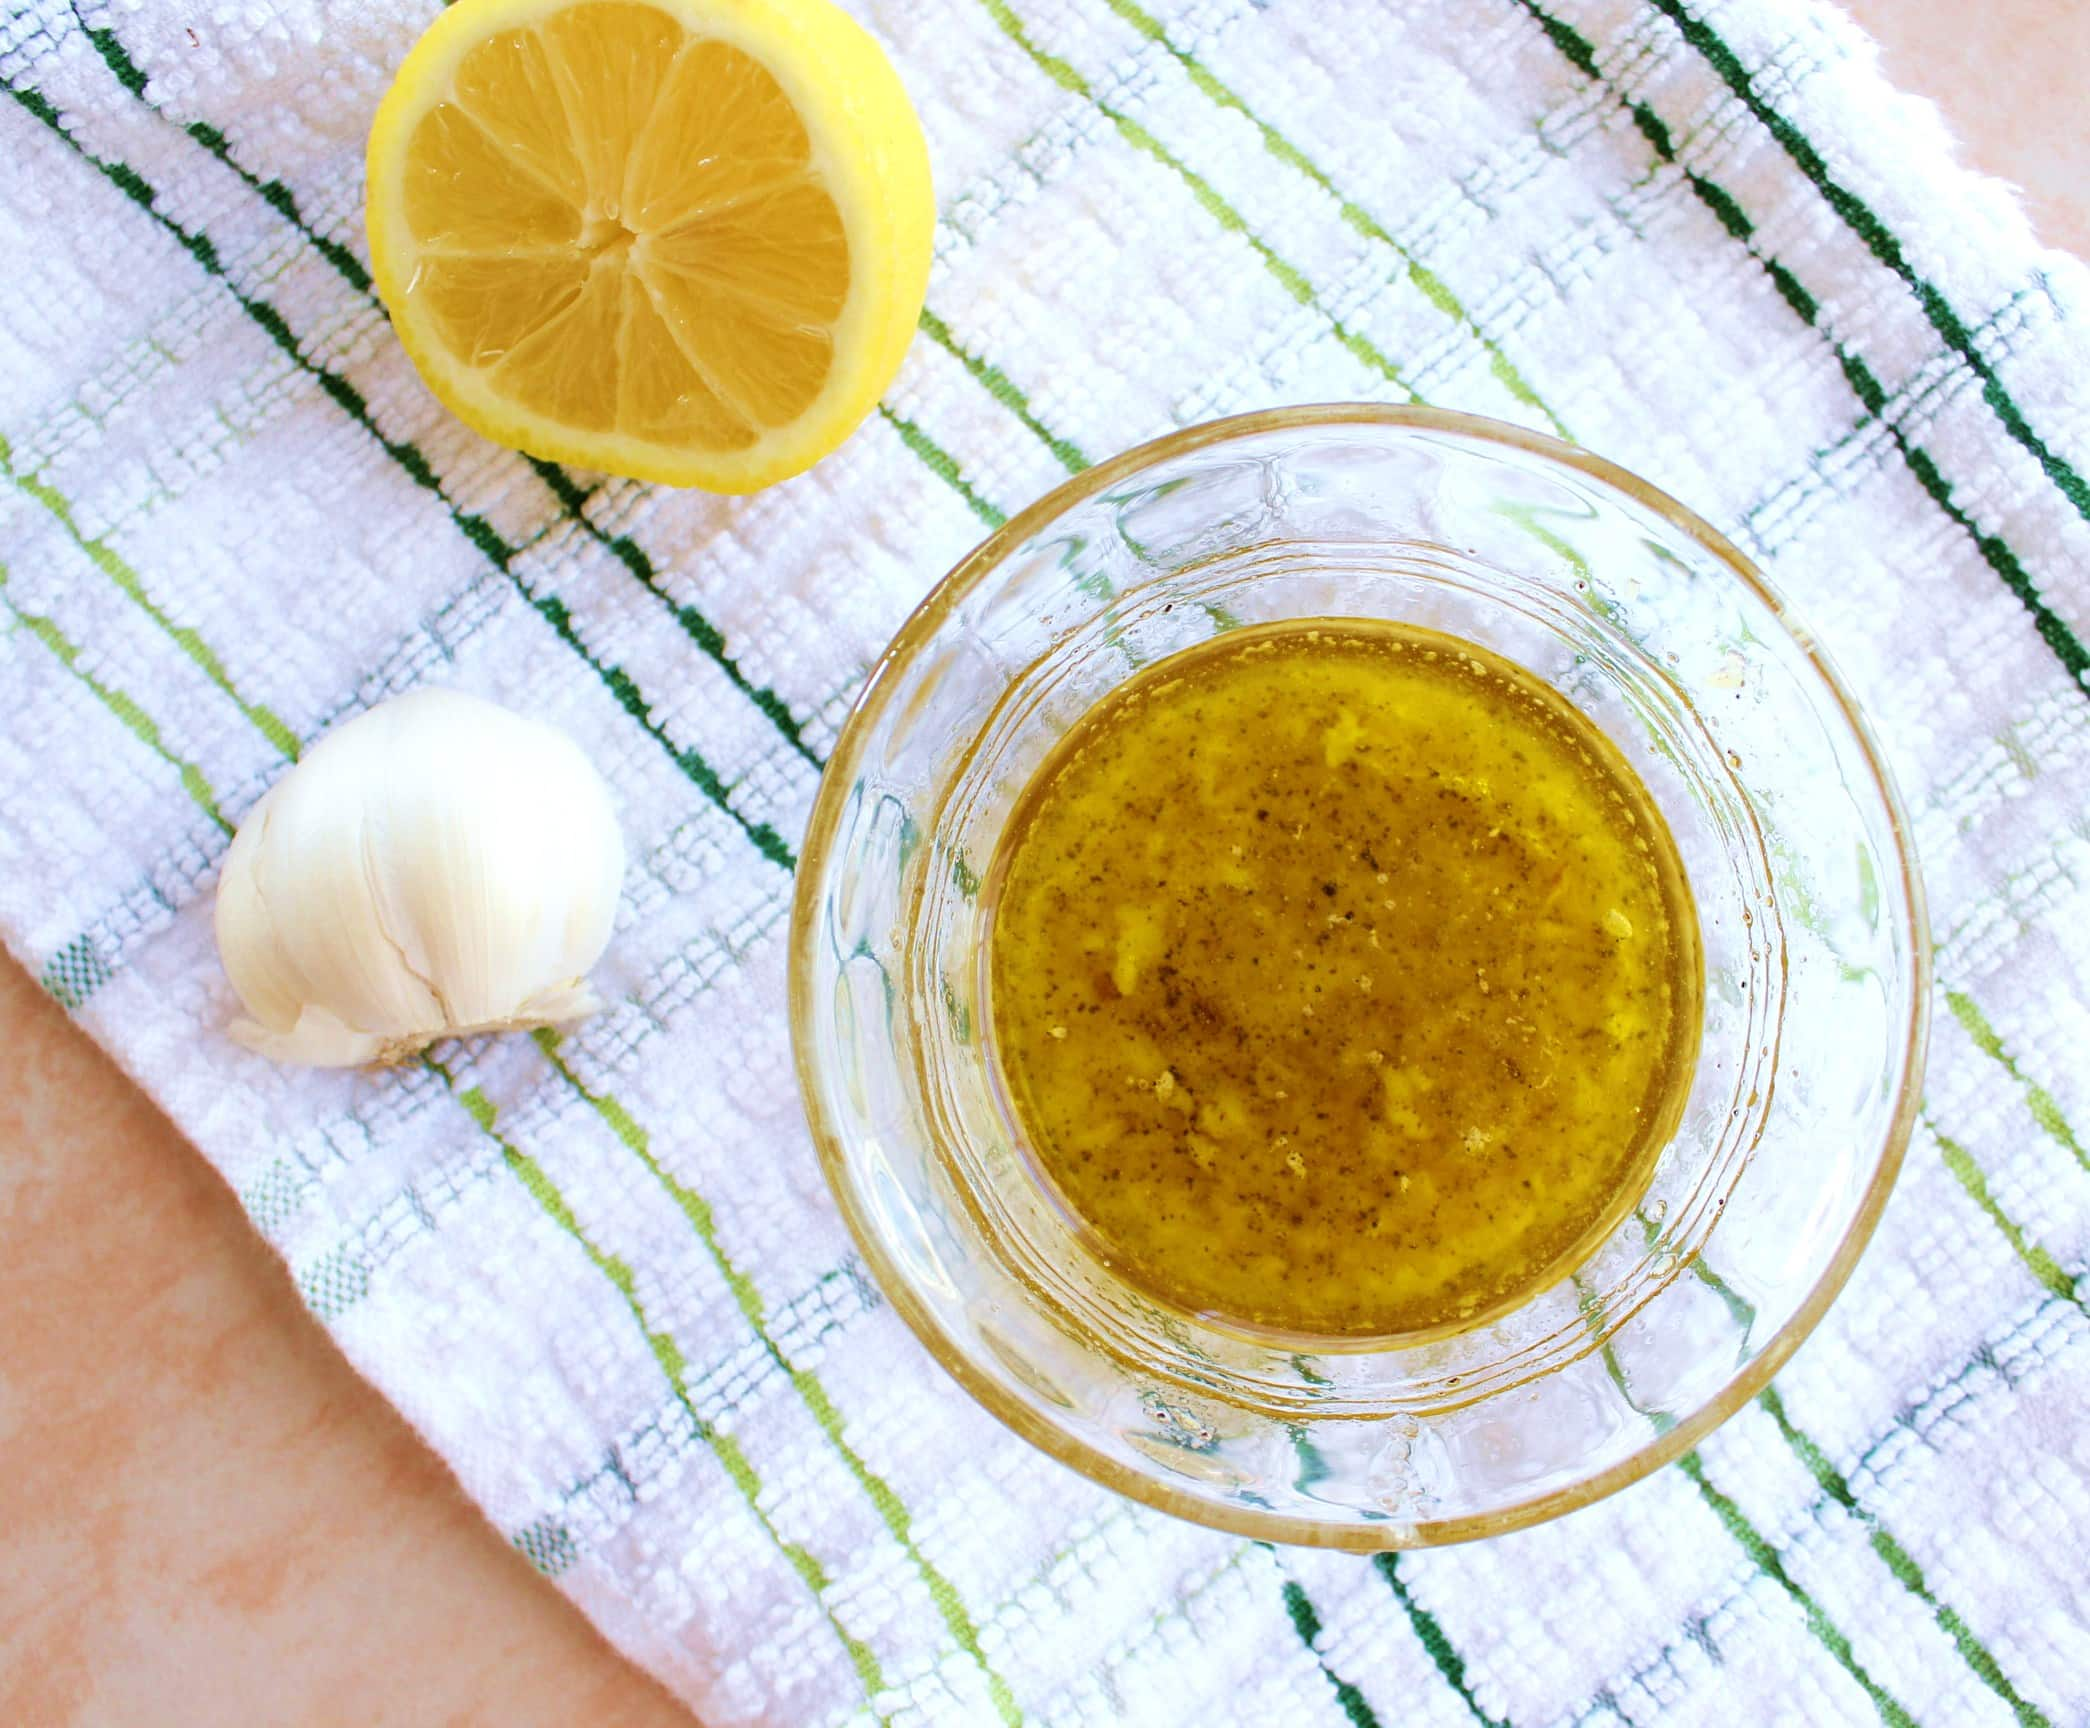 Extra virgin olive oil, fresh minced garlic, lemon juice and zest, honey, freshly cracked black pepper